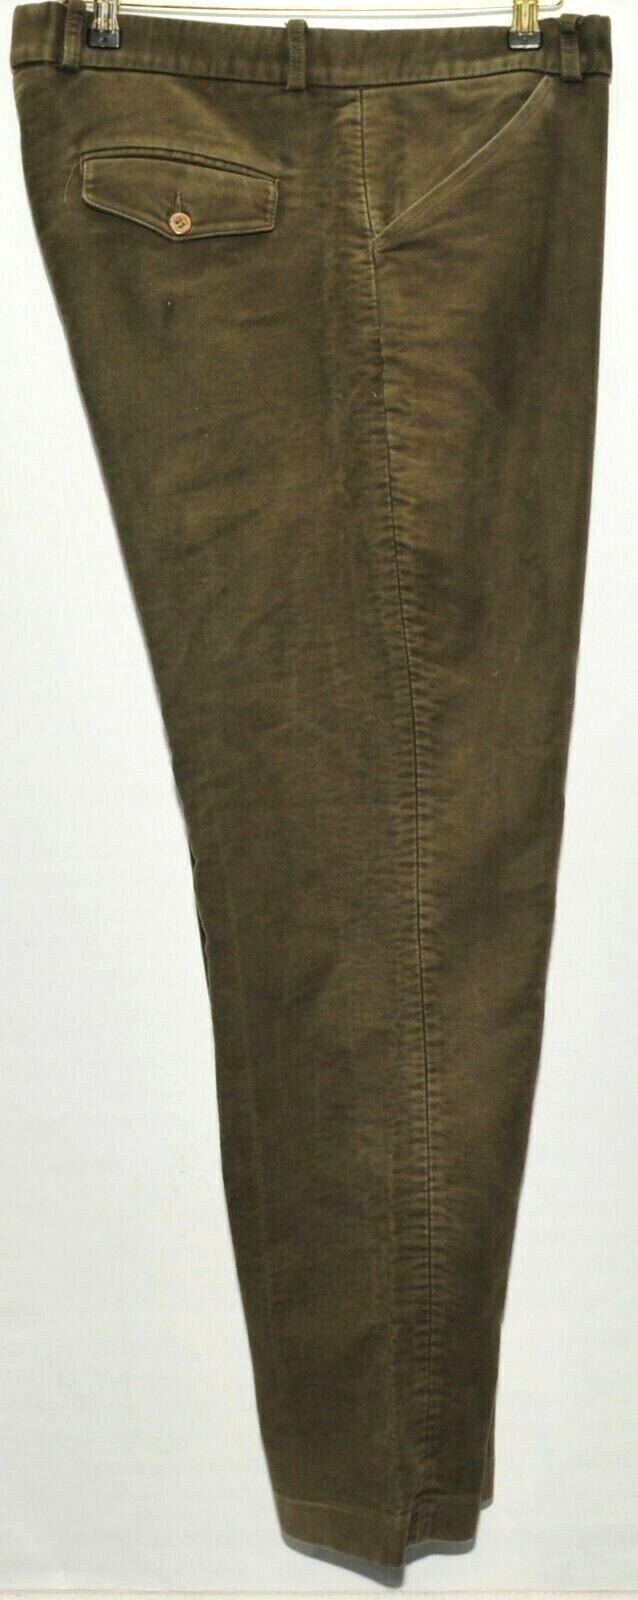 Hommes HOGGS OF FIFE vert MOLESKIN TROUSERS Taille 38 W  31  L